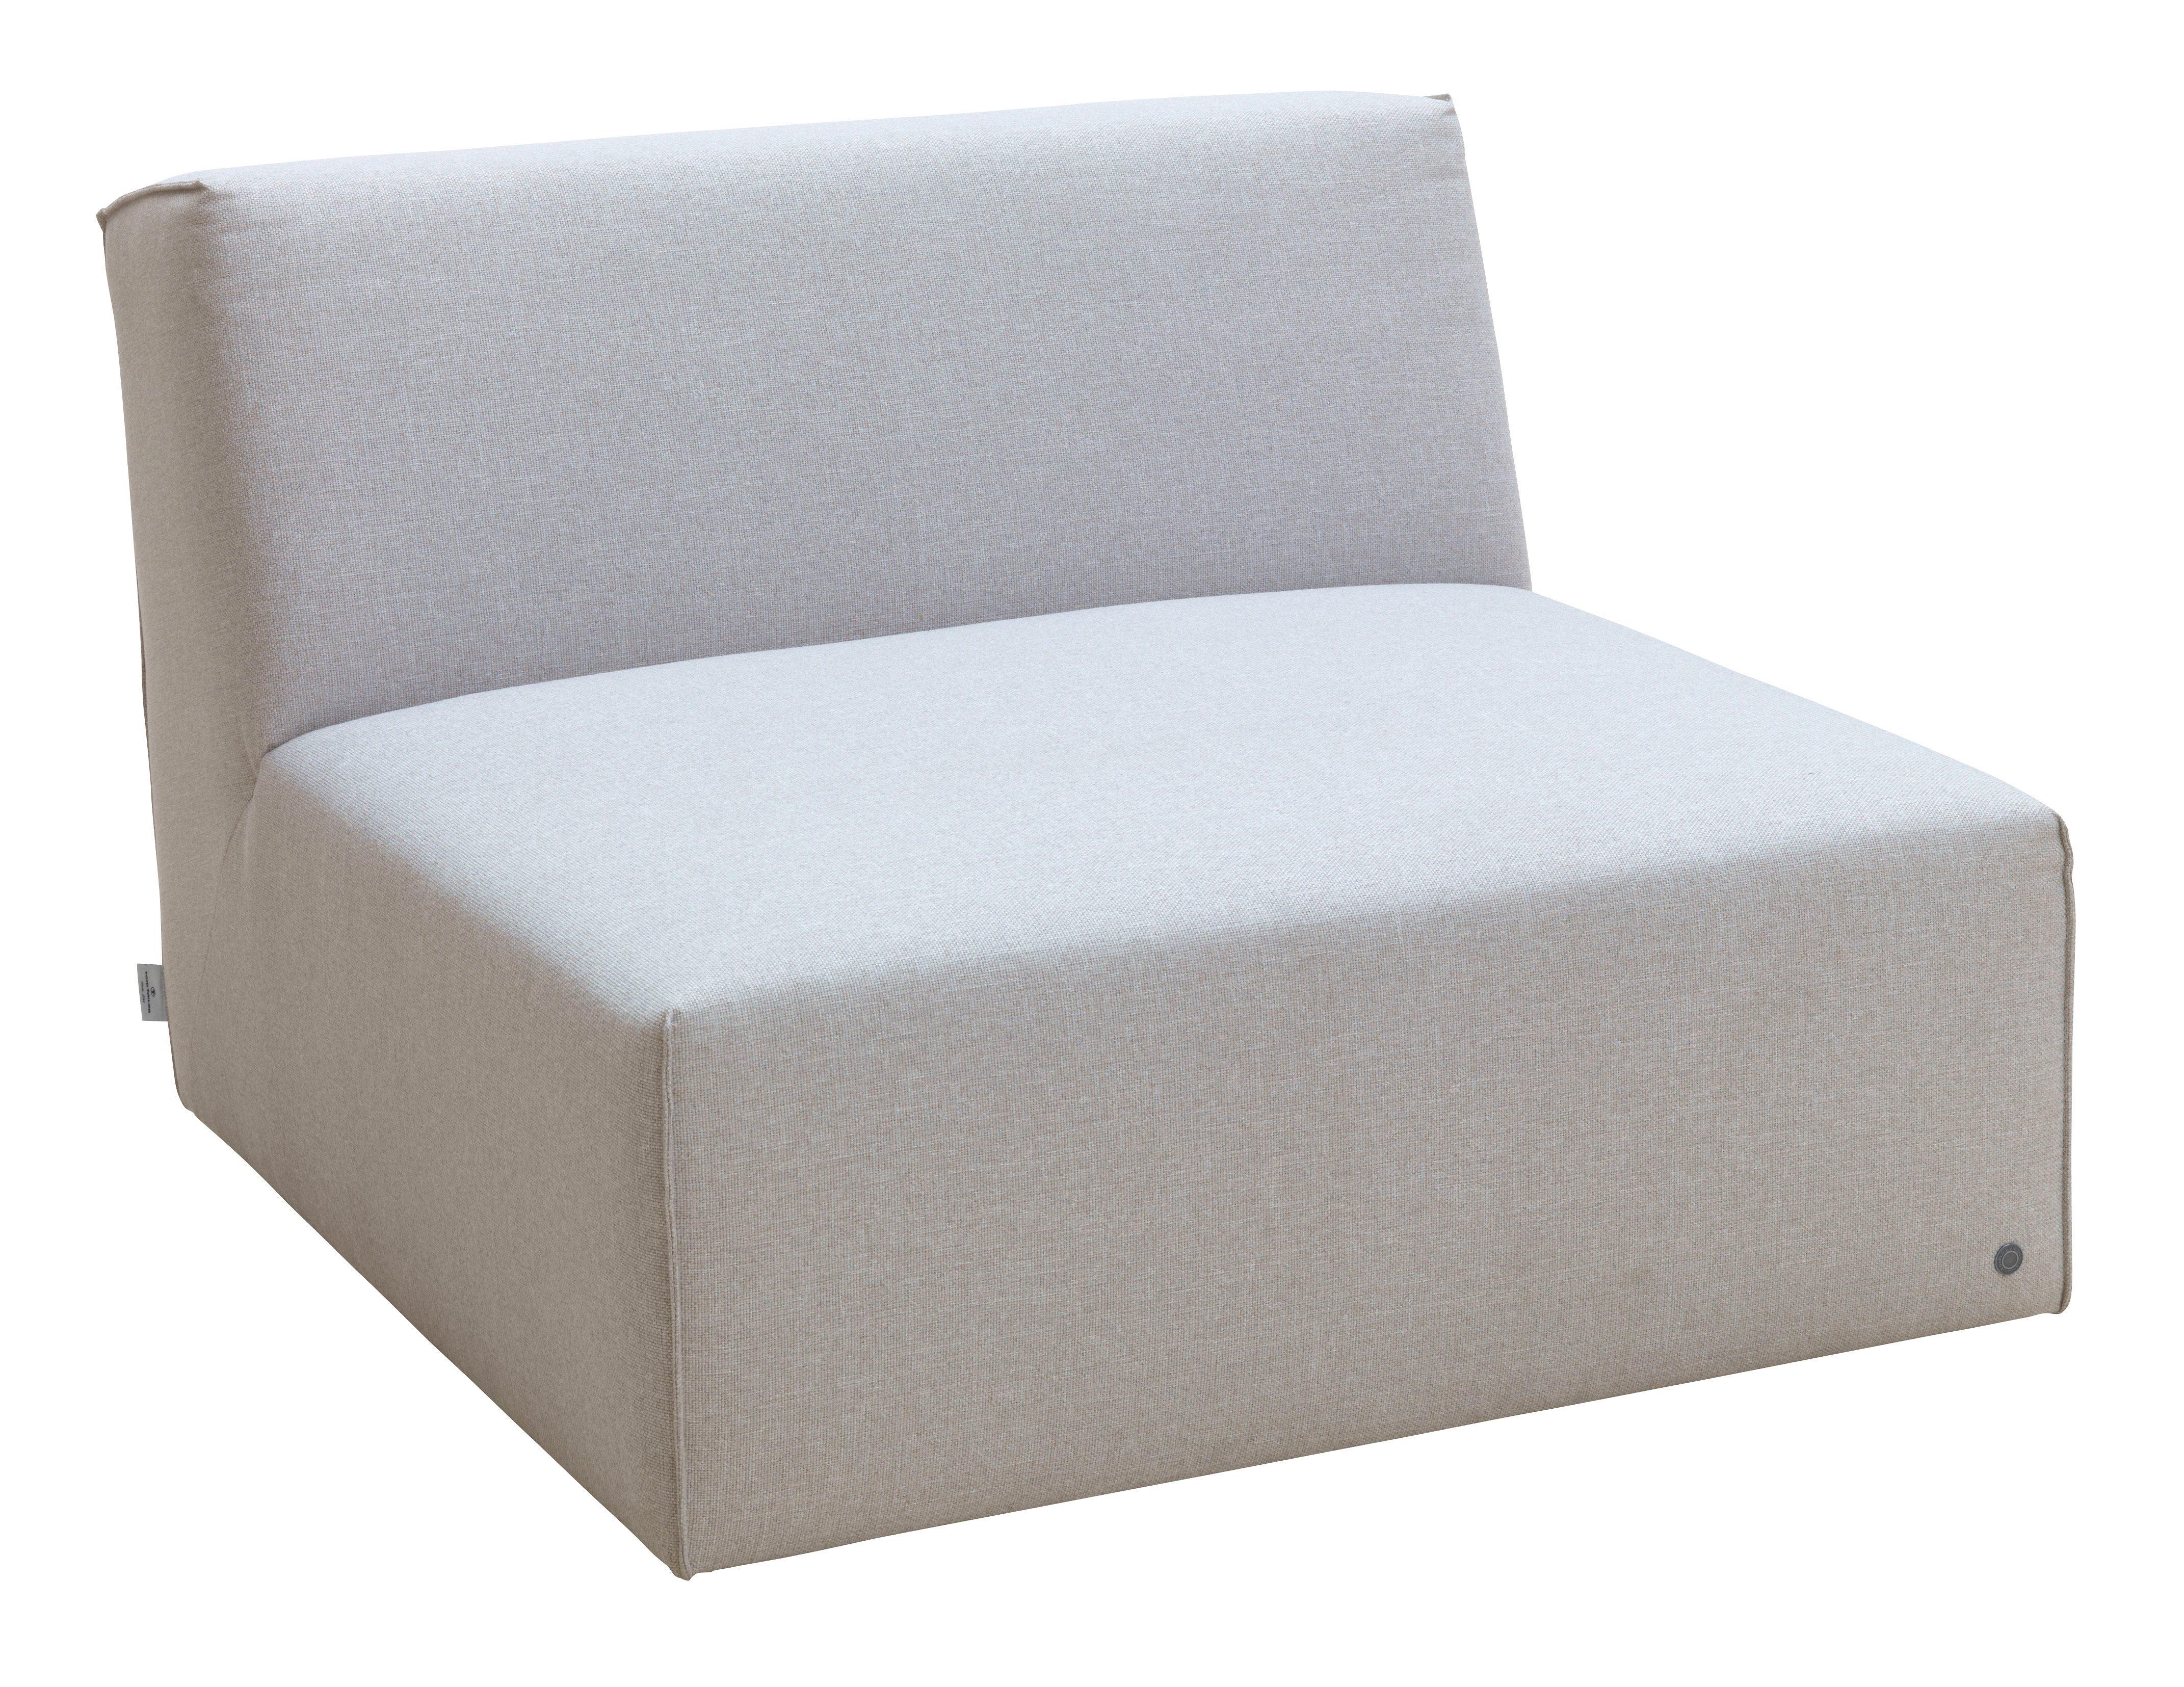 TOM TAILOR Sofaelement ELEMENTS, Sitzelement ohne Armlehne grau Sofaelemente Sofas Couches